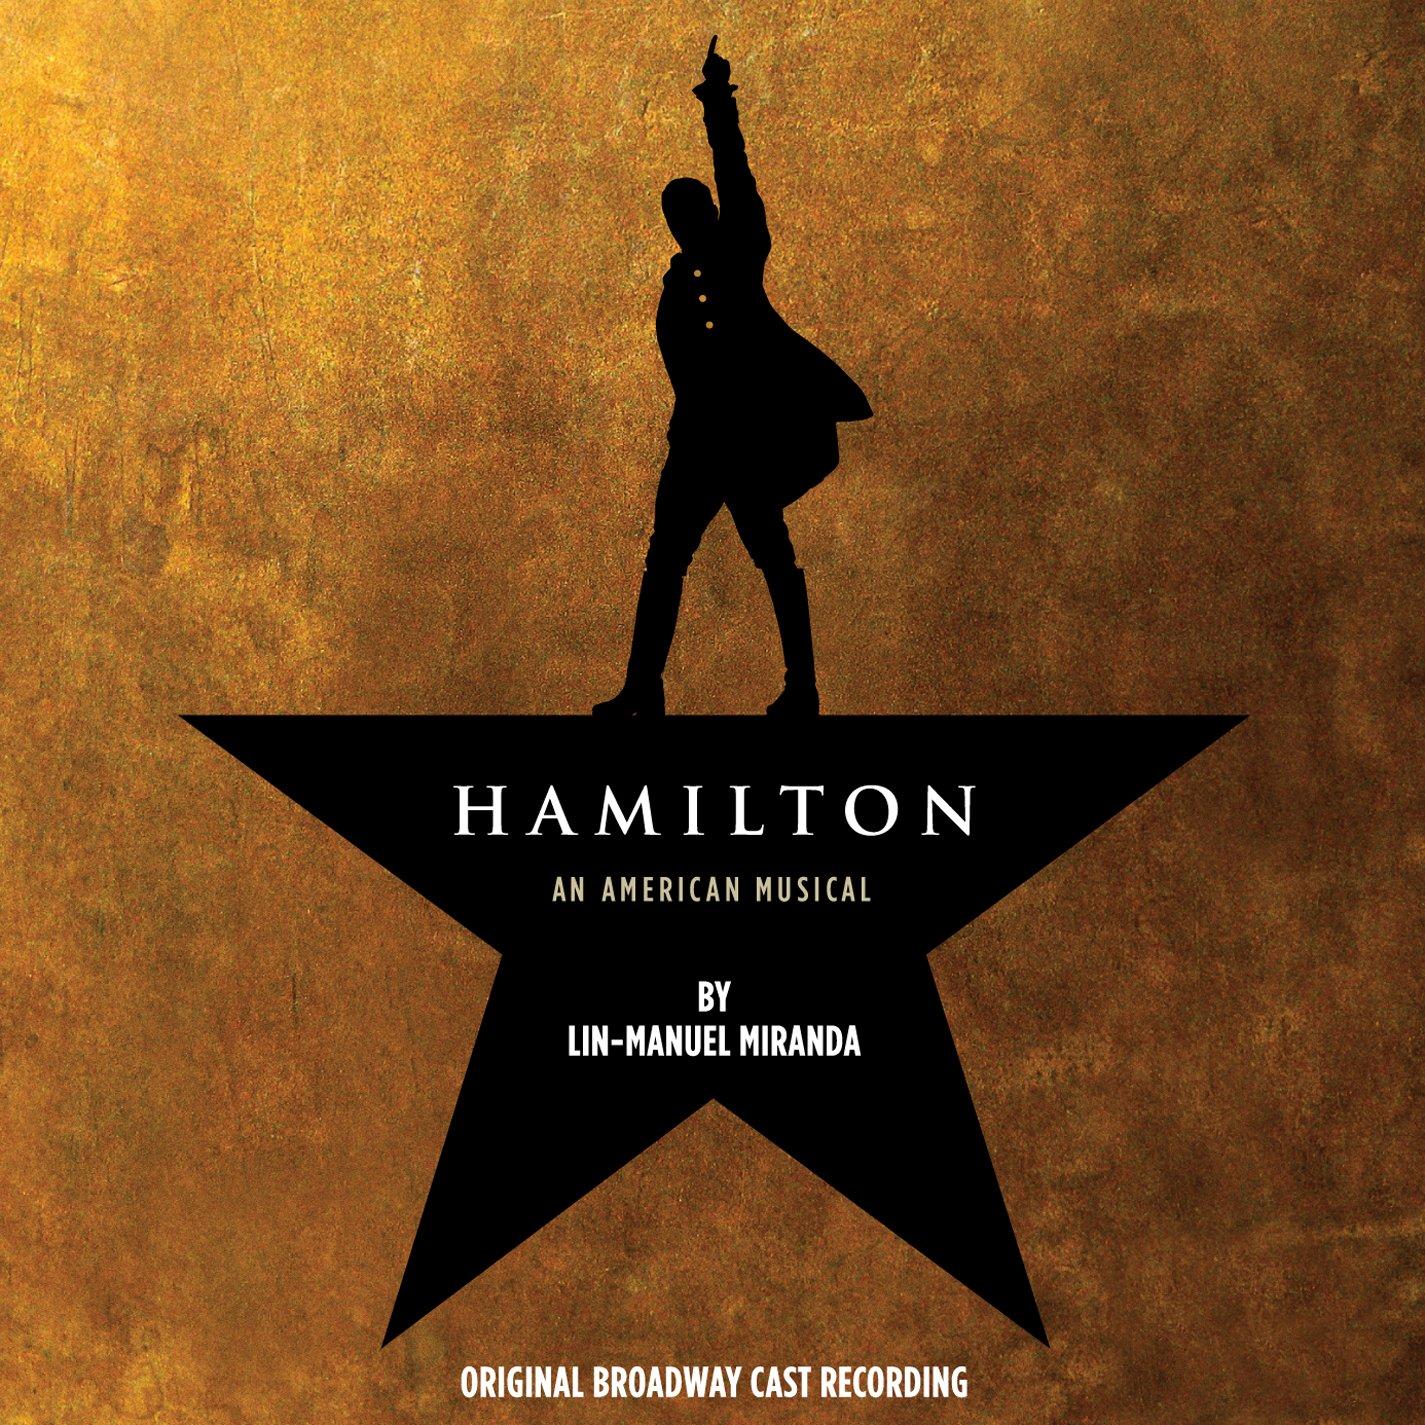 Hamilton (Original Broadway Cast Recording)(Explicit)(2CD) by Atlantic